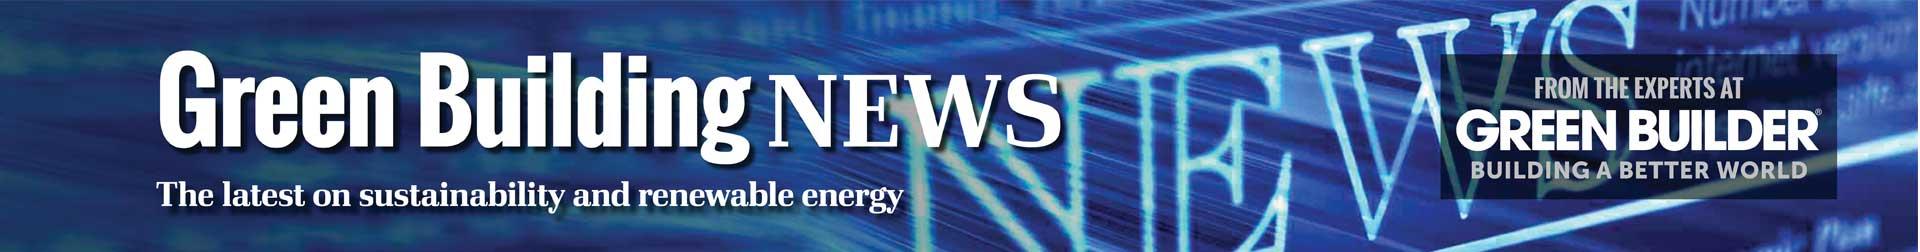 green-building-news.jpg